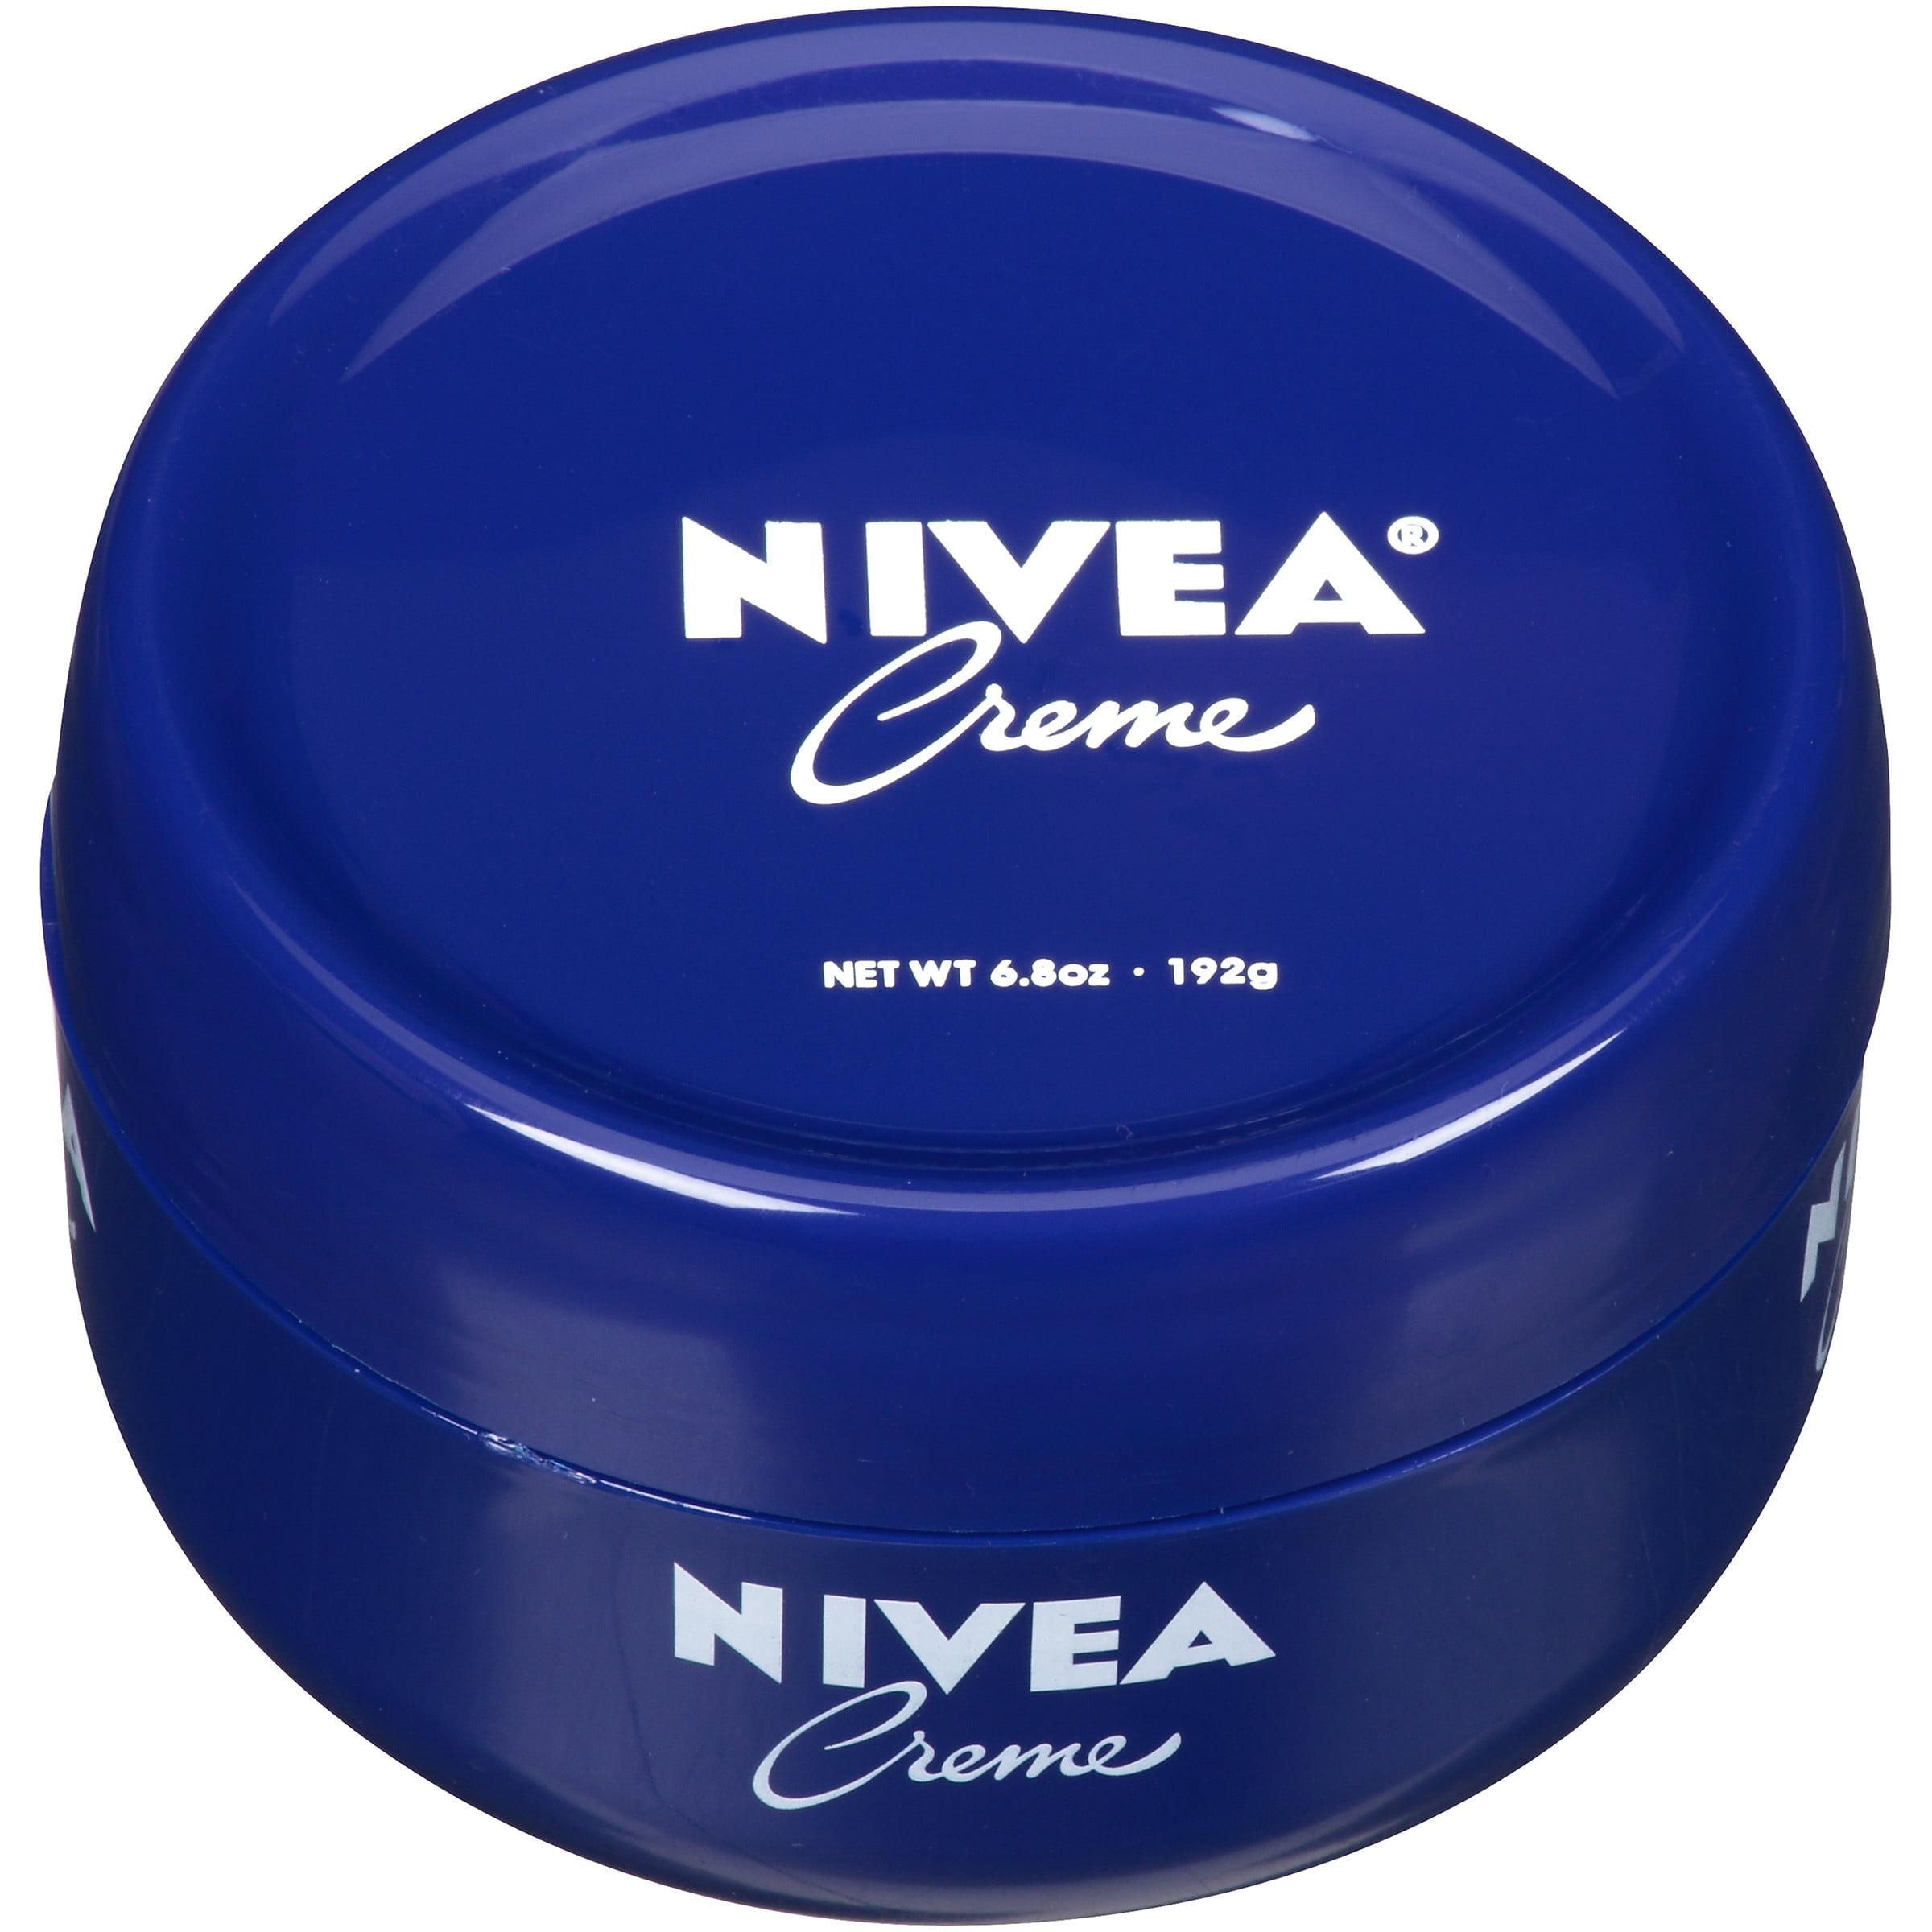 Nivea Creme, 6.8 oz - Walmart.com